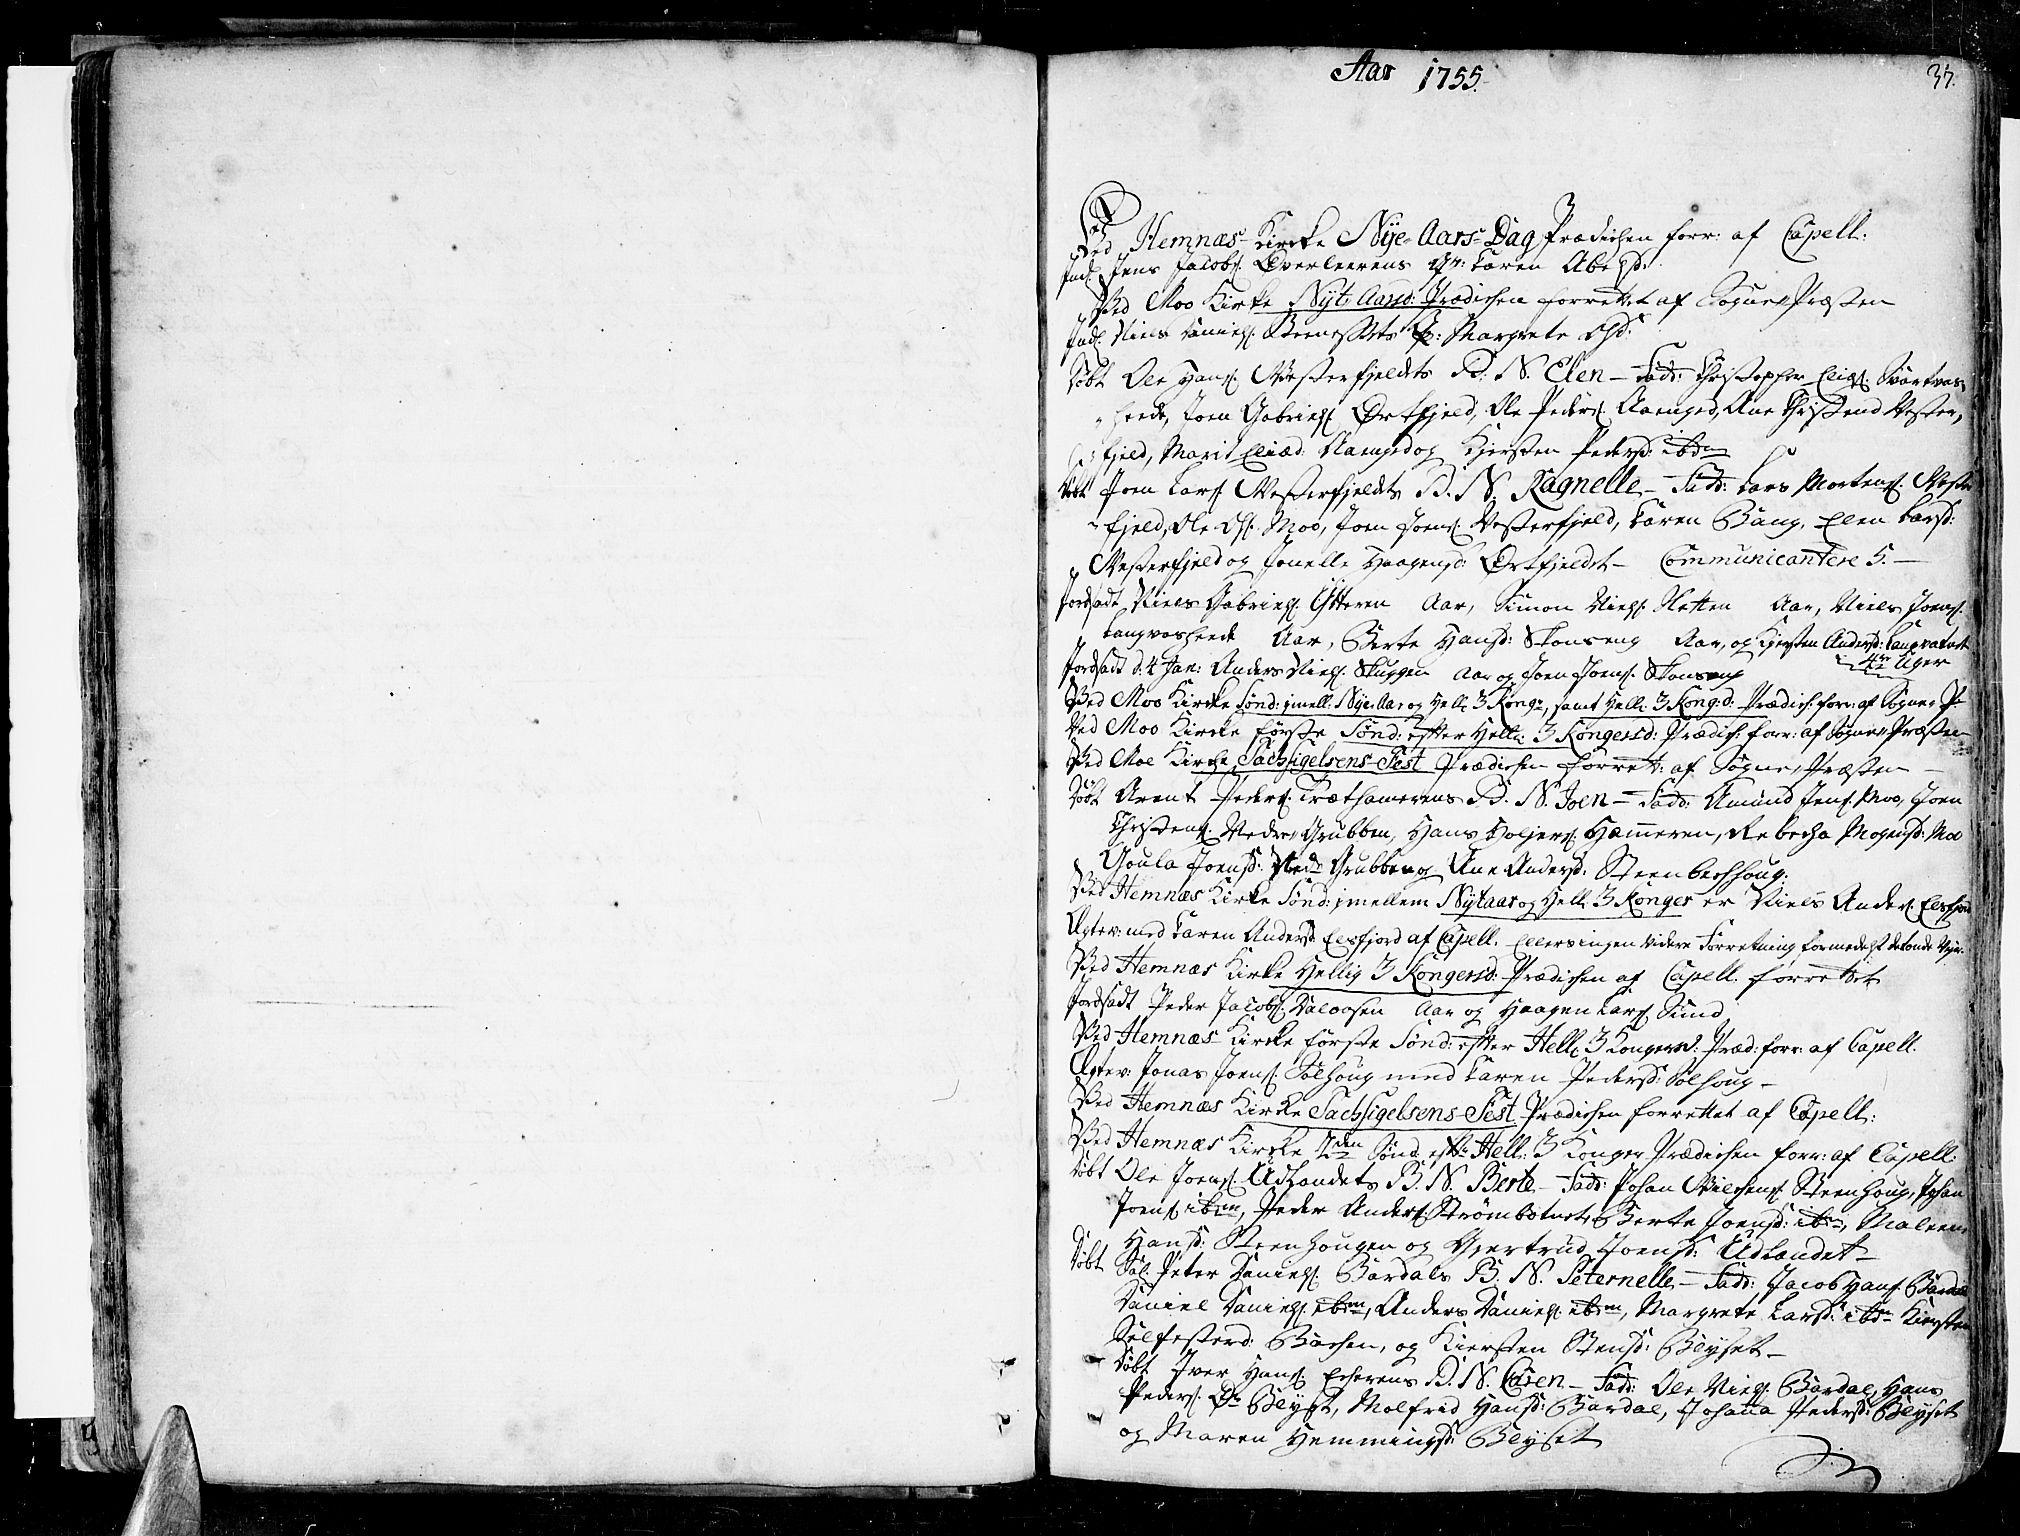 SAT, Ministerialprotokoller, klokkerbøker og fødselsregistre - Nordland, 825/L0348: Ministerialbok nr. 825A04, 1752-1788, s. 37